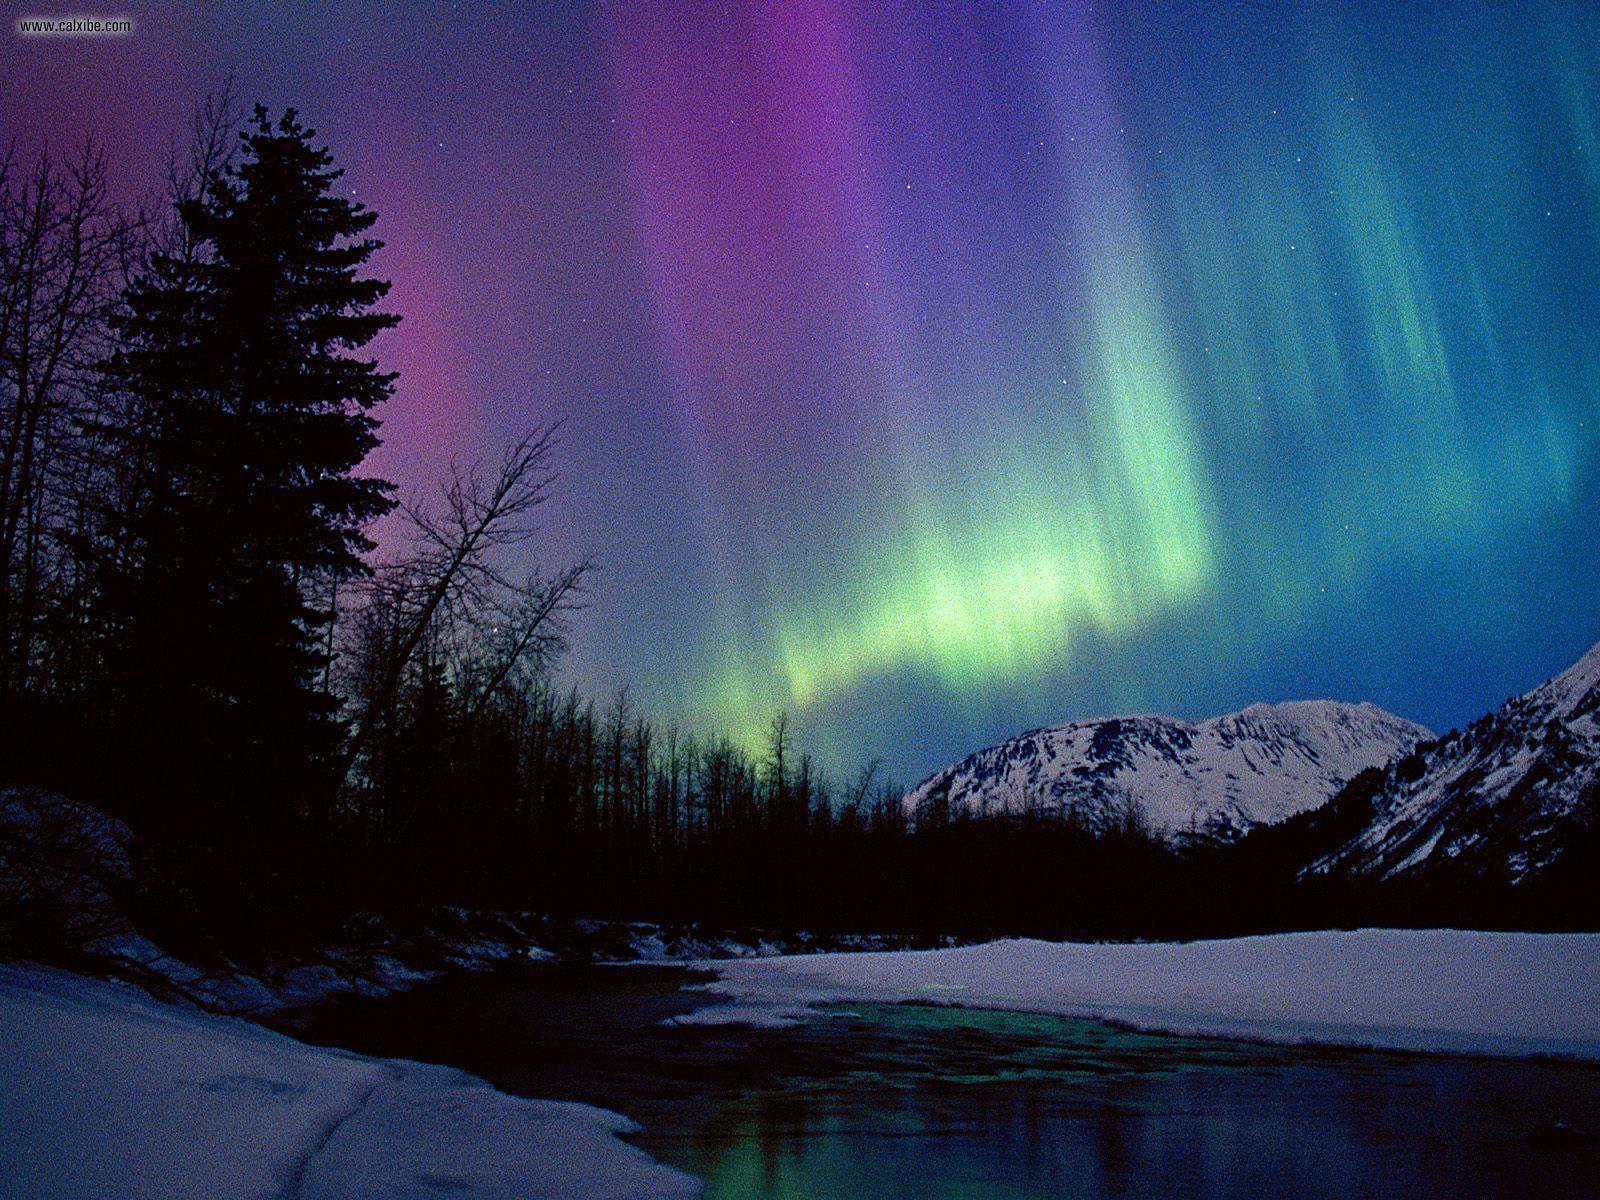 Aurora Borealis in Alaska Art Exhibit of Nature 1600x1200